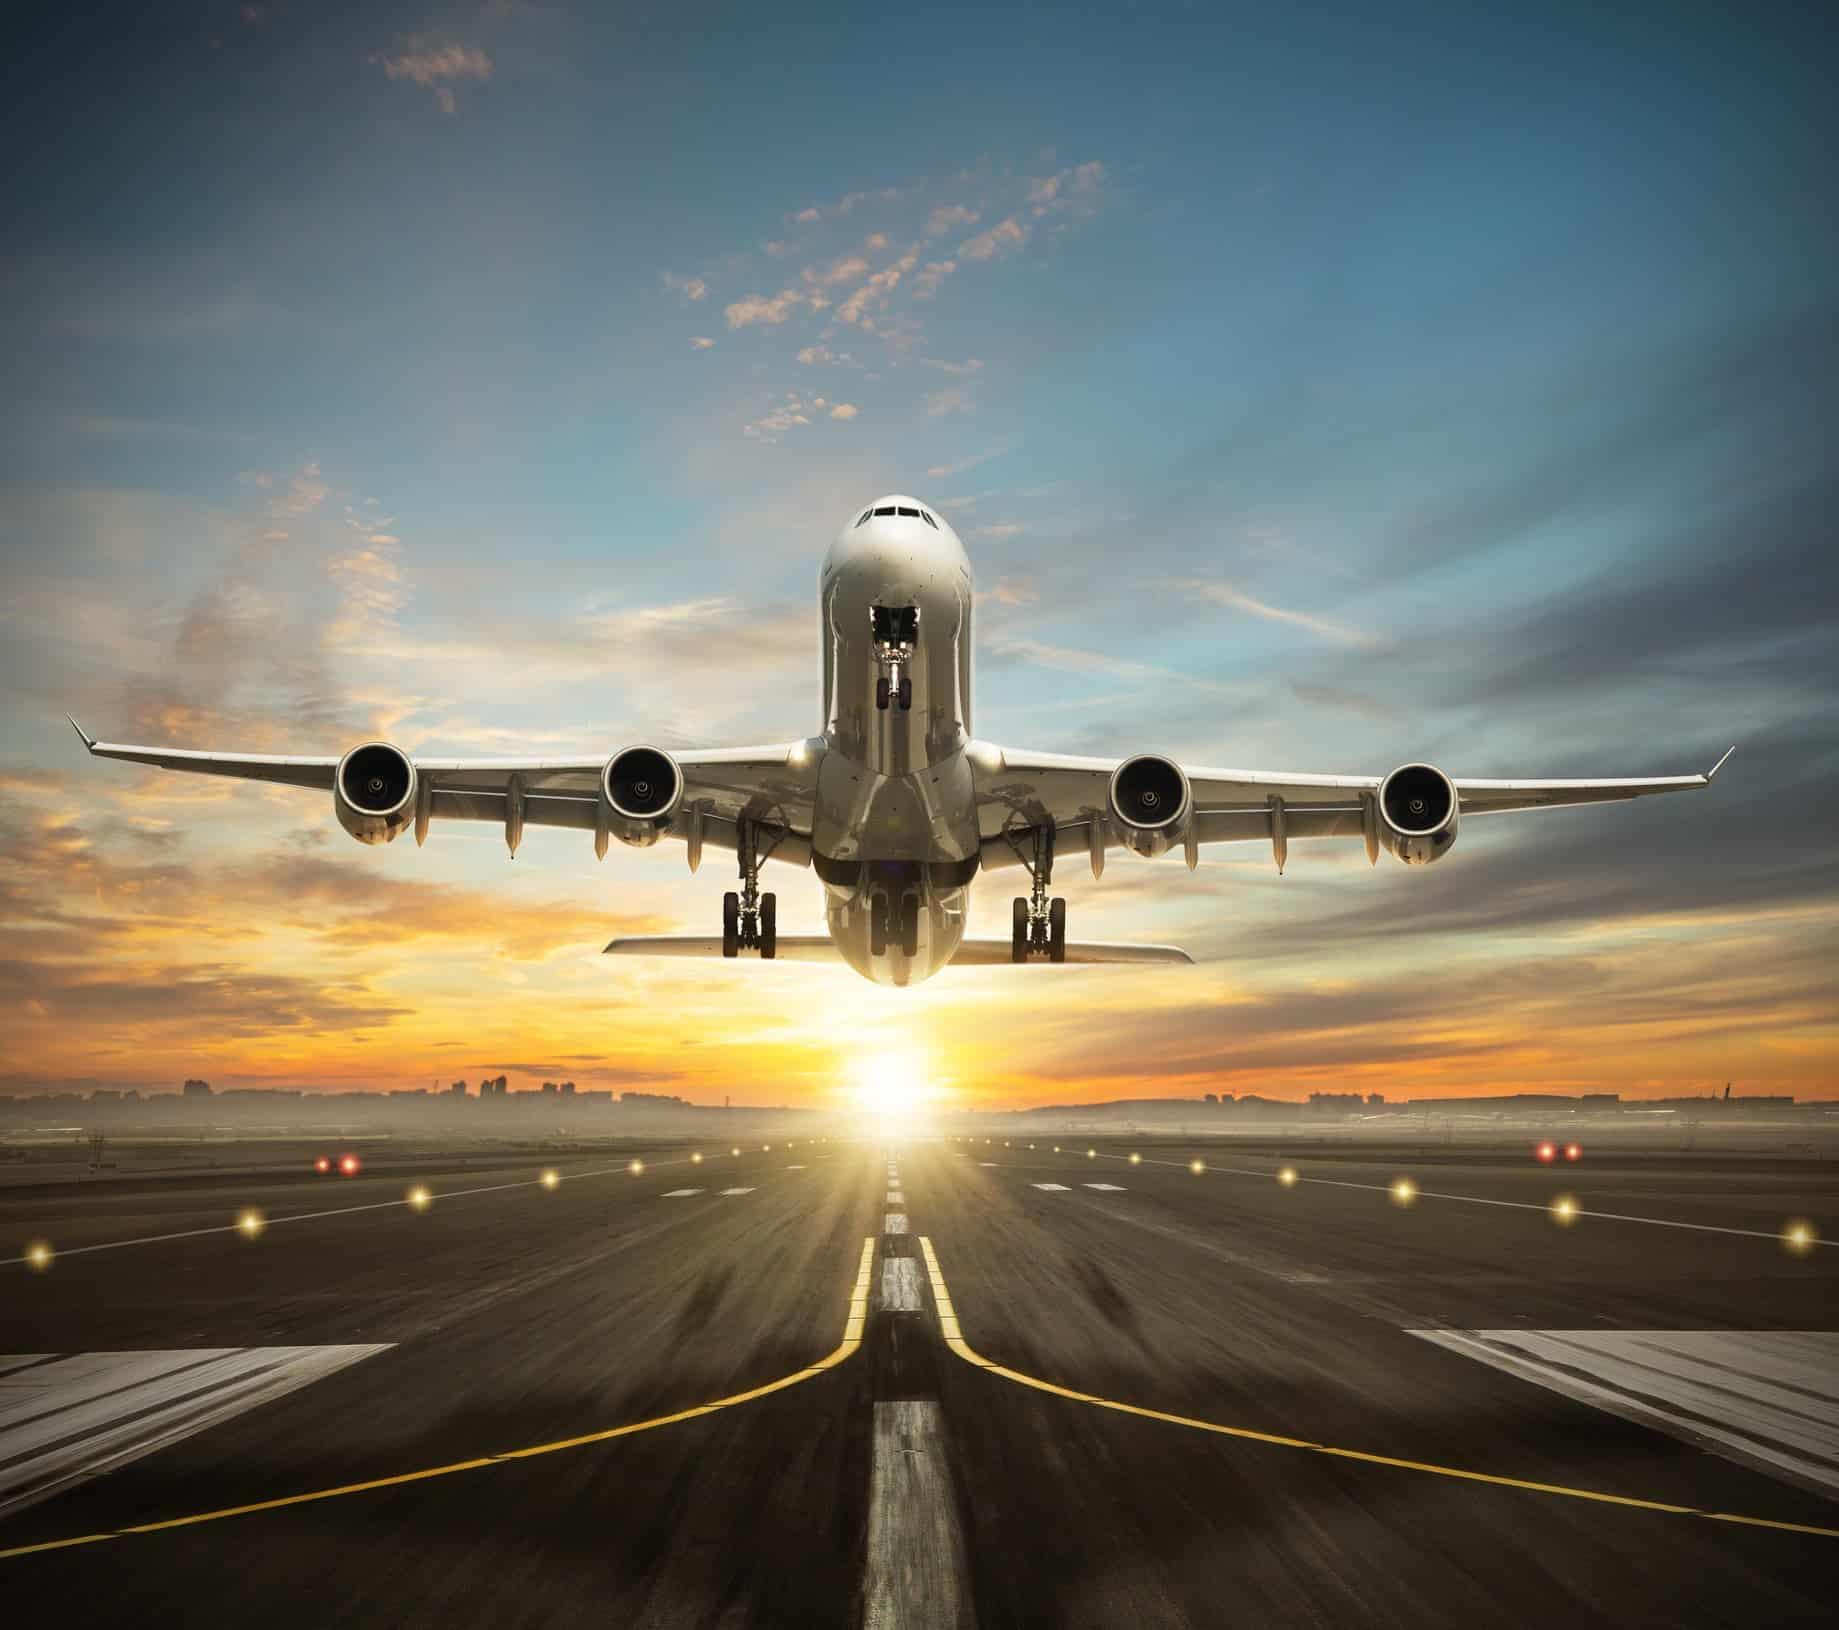 airplane-takeoff-getty